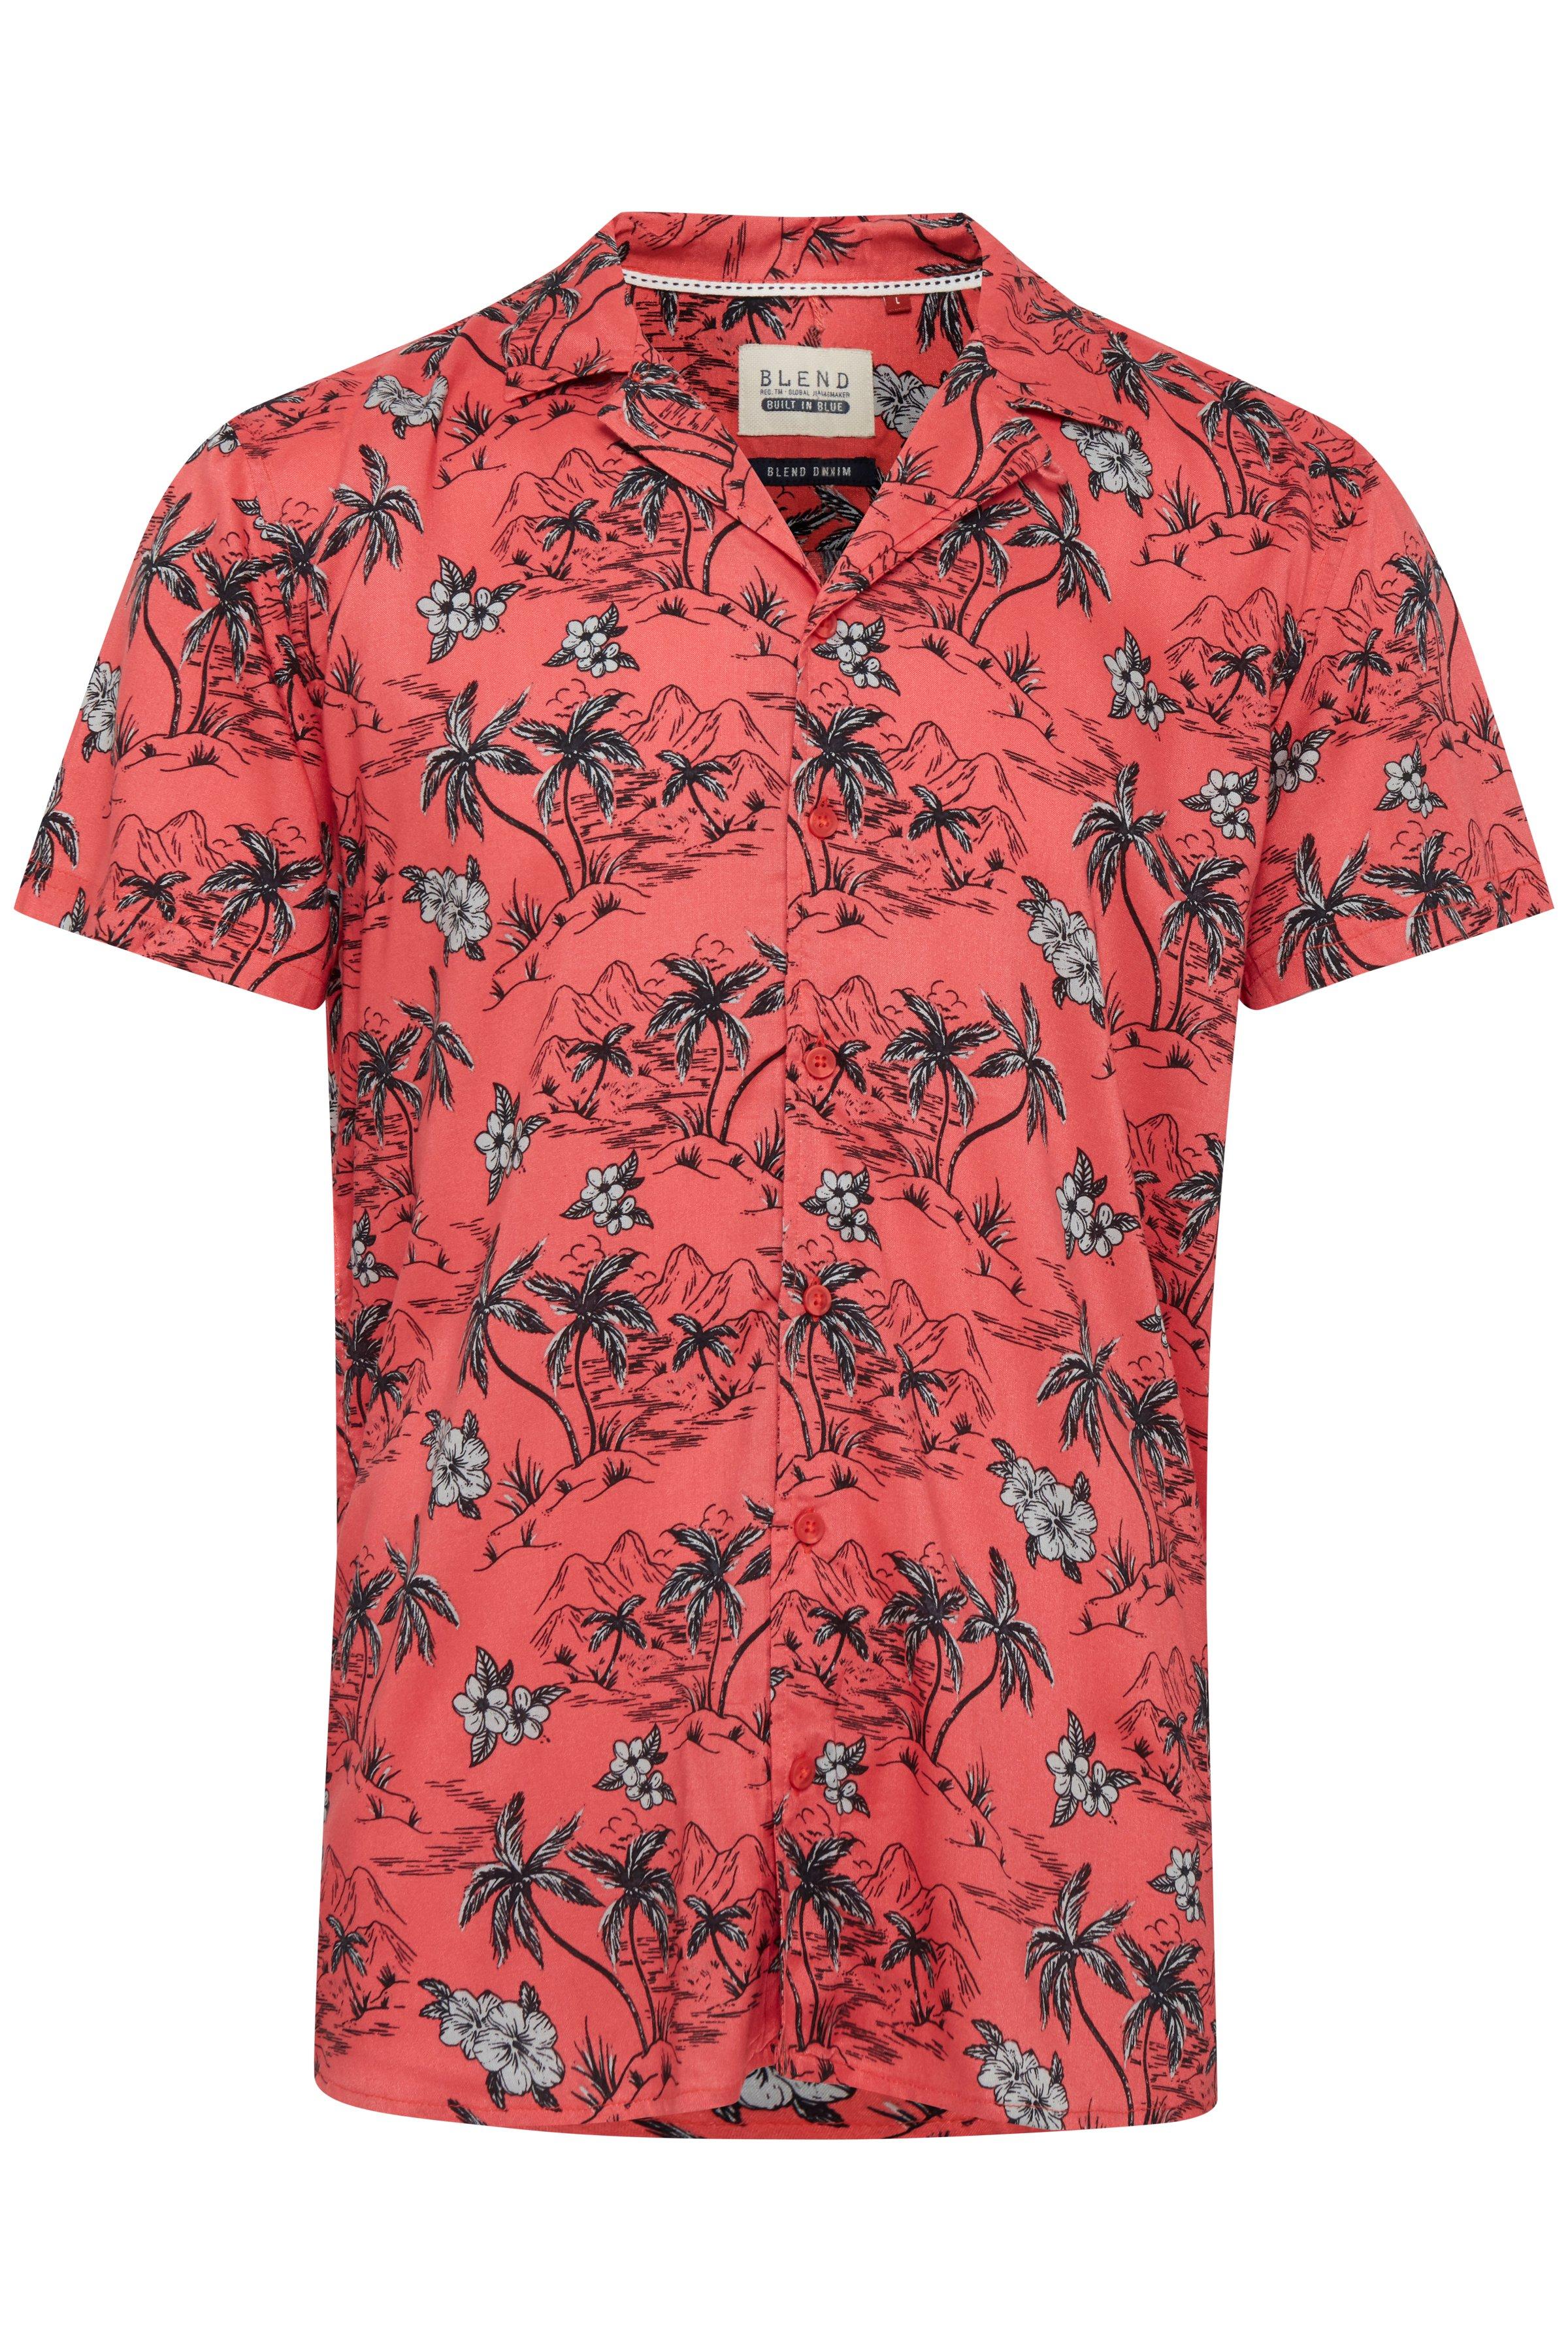 Cayenne Shirt fra Blend He – Køb Cayenne Shirt fra str. S-XL her